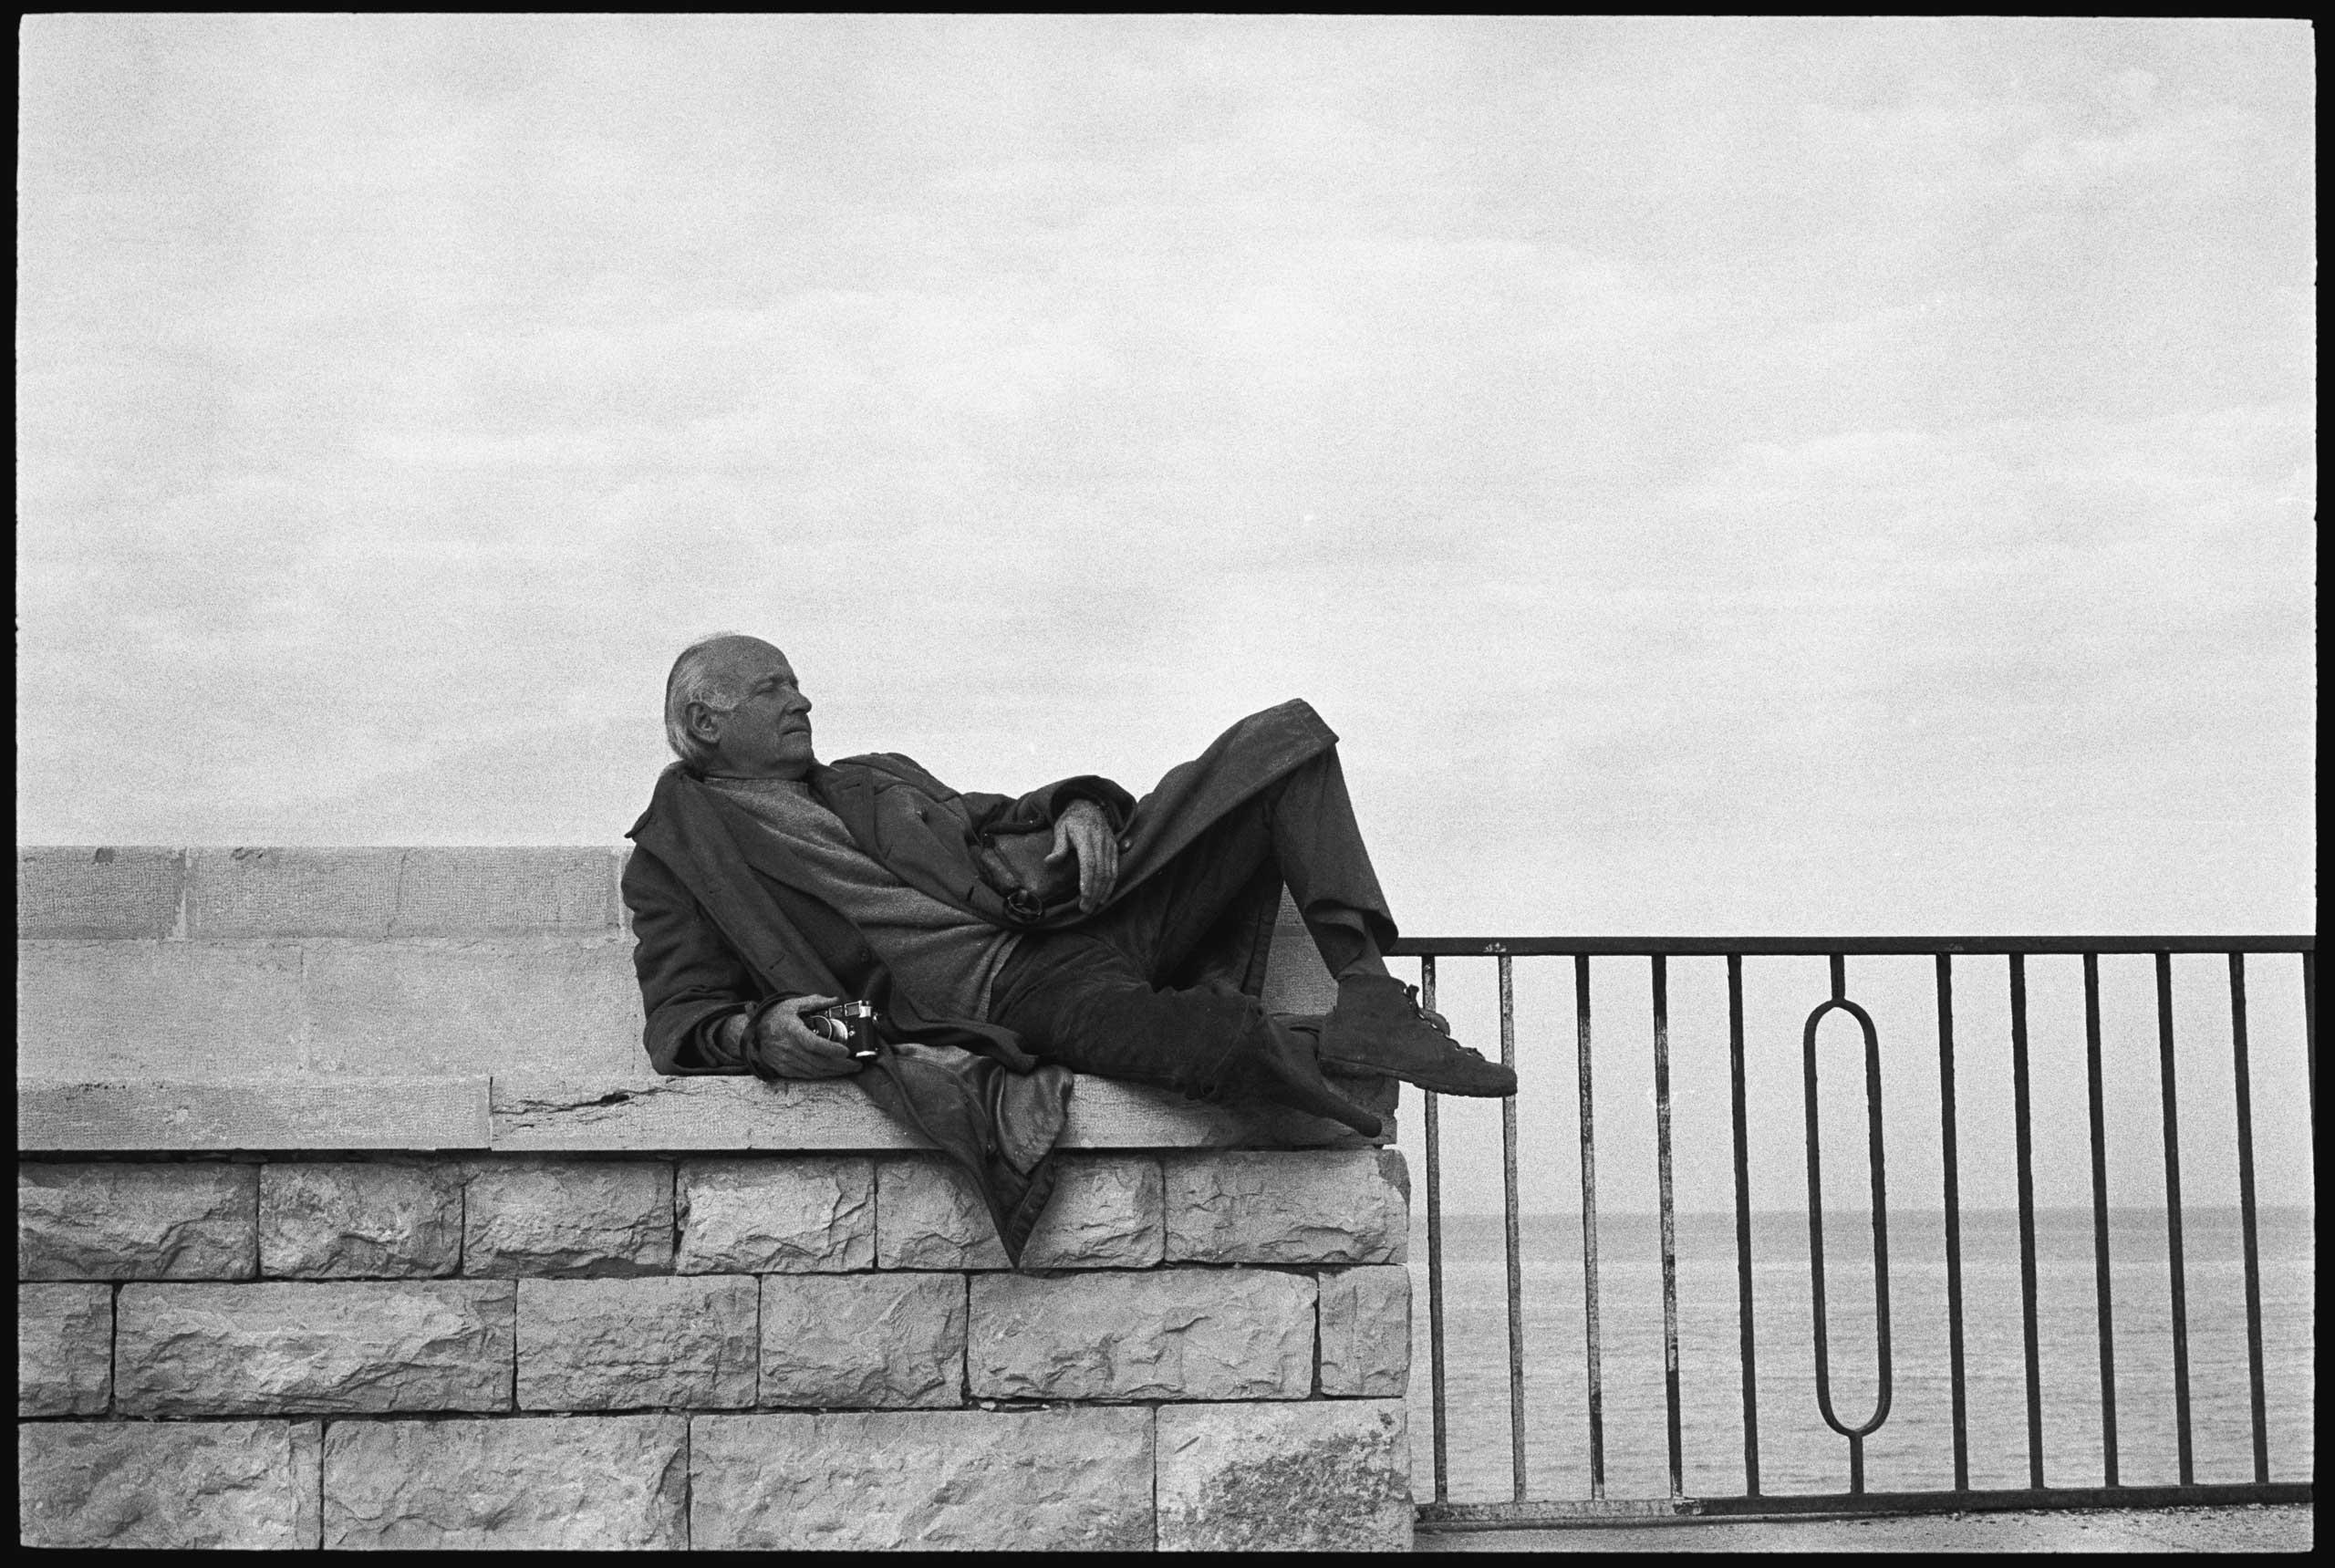 Henri Cartier-Bresson in Italy in 1971.